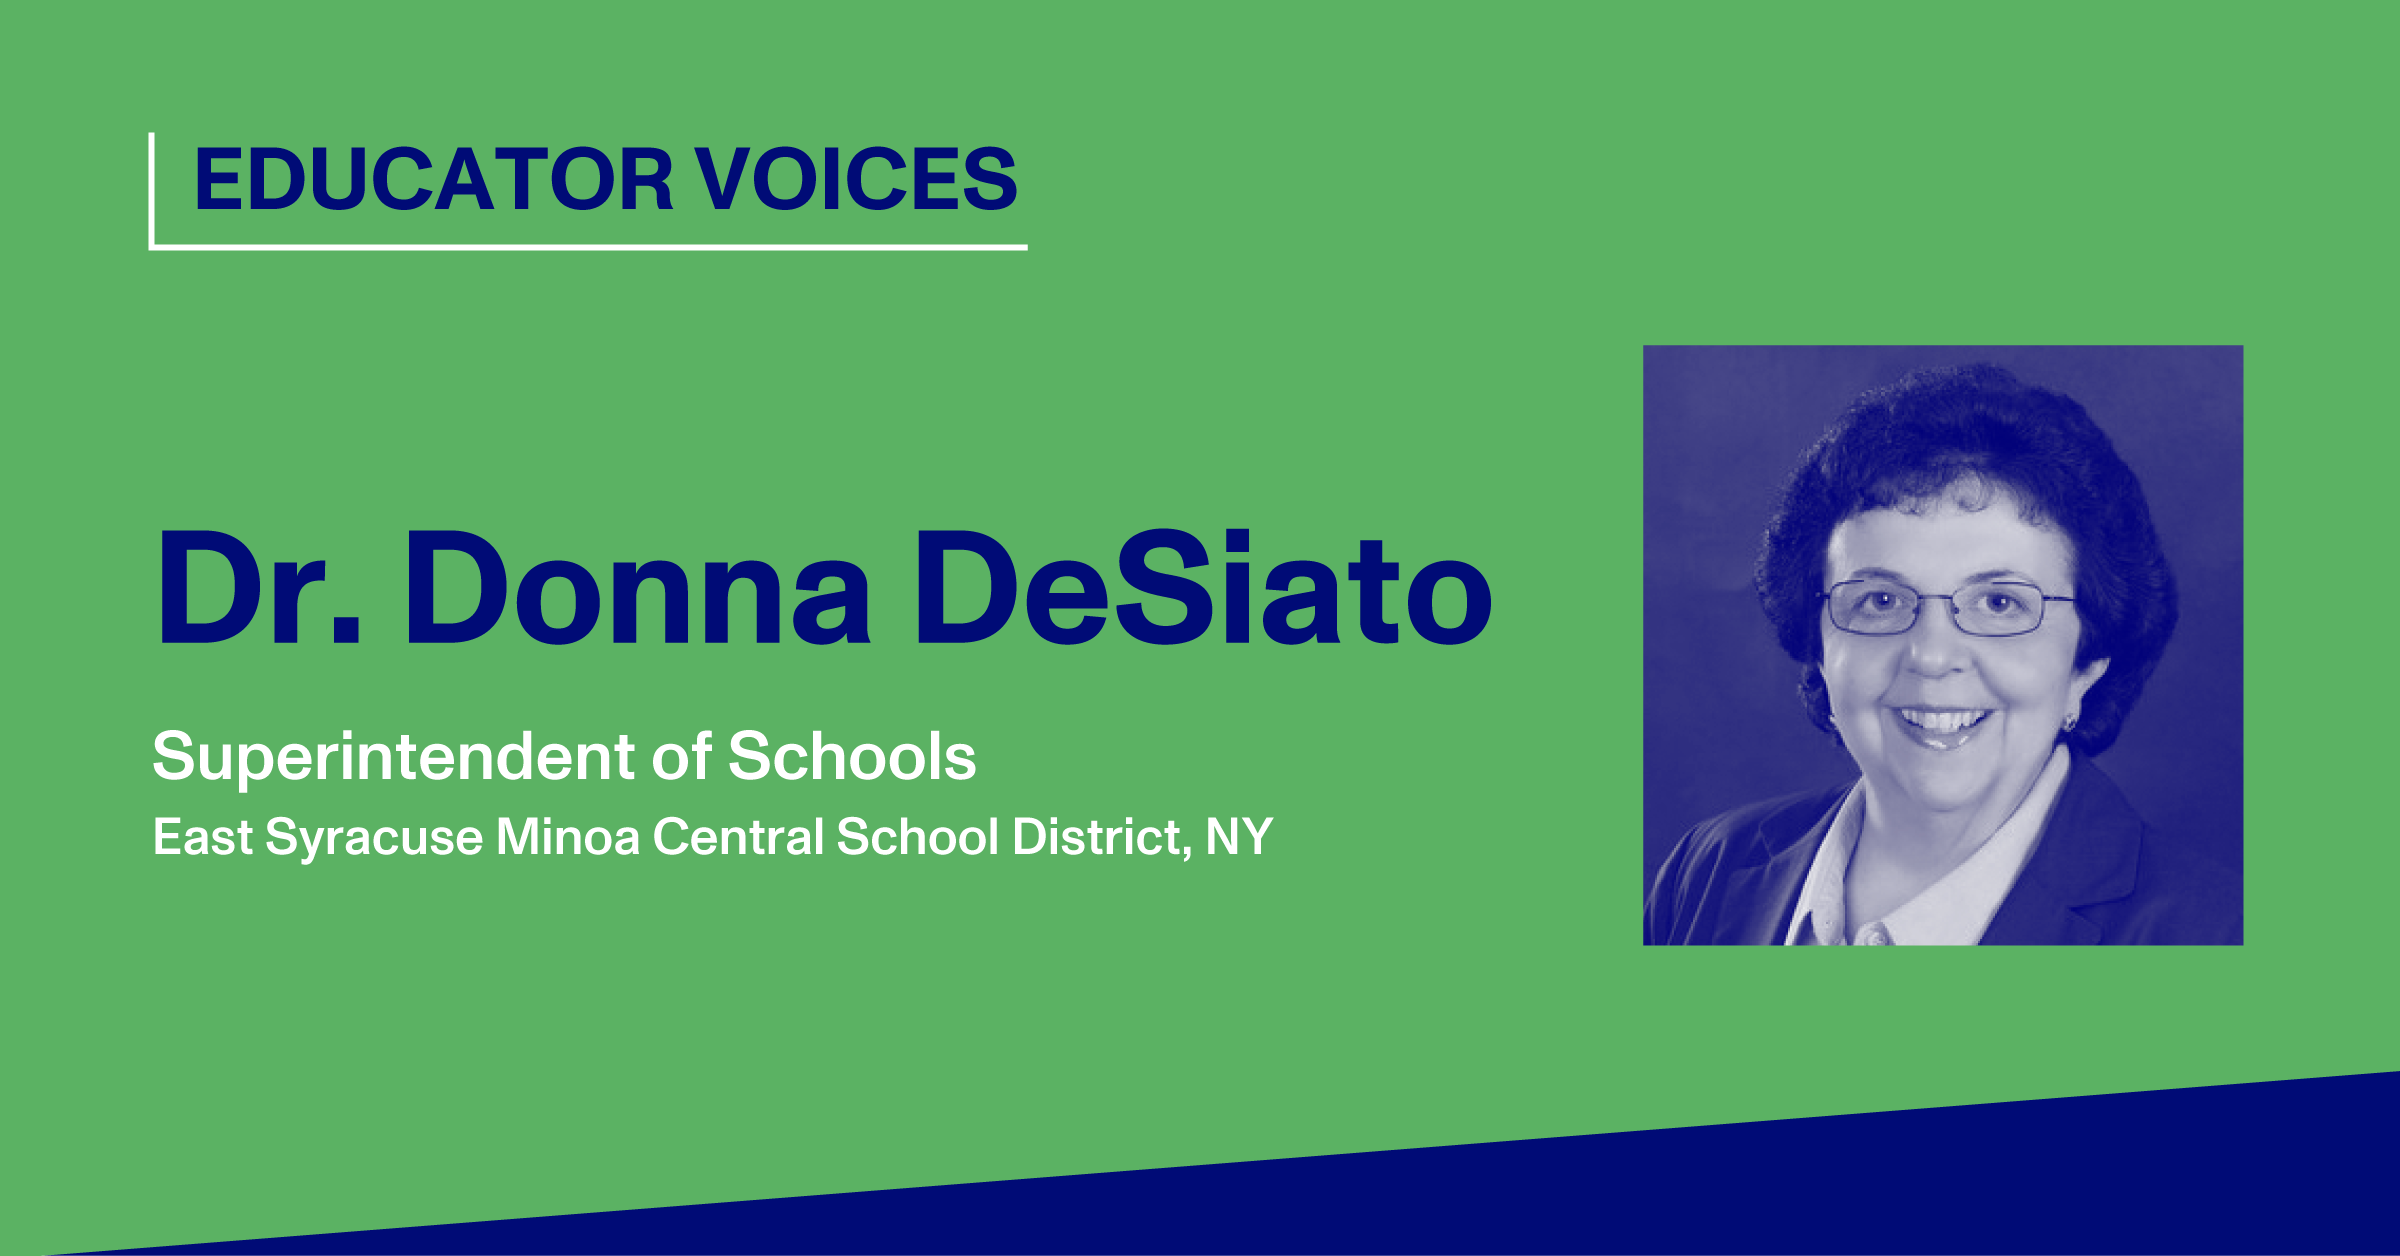 Blog Thumbnail - Headshot of Dr Donna DeSiato